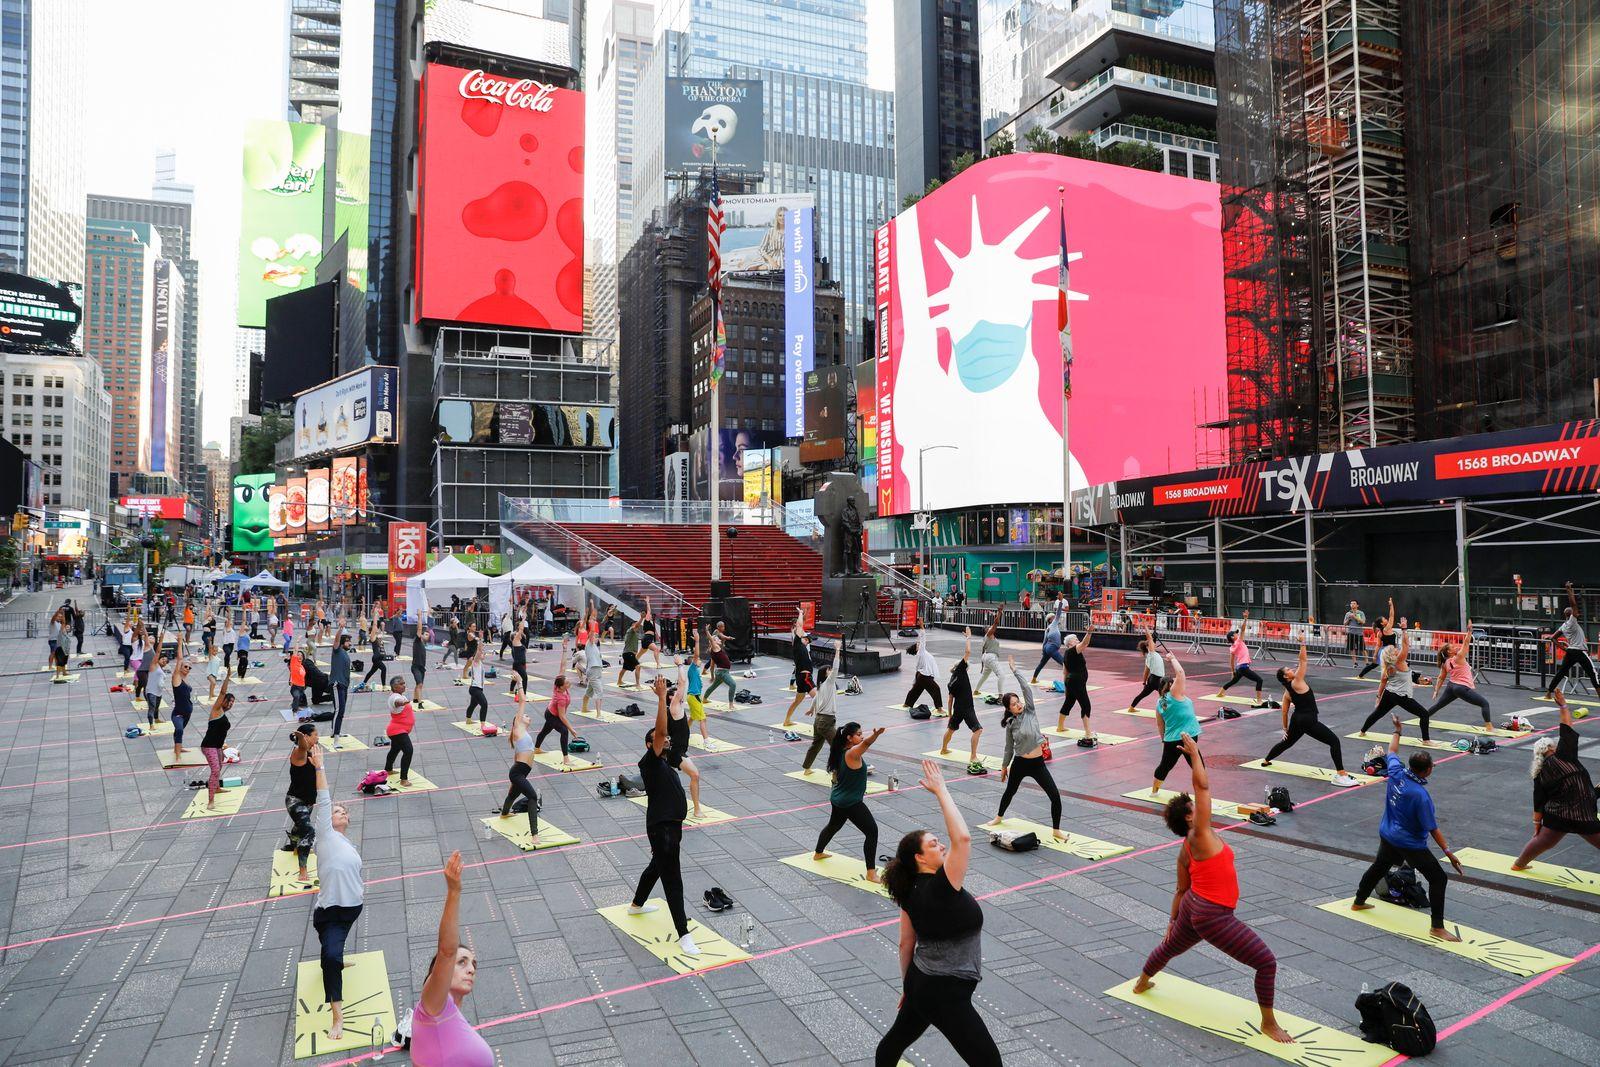 Summer solstice celebrations in New York